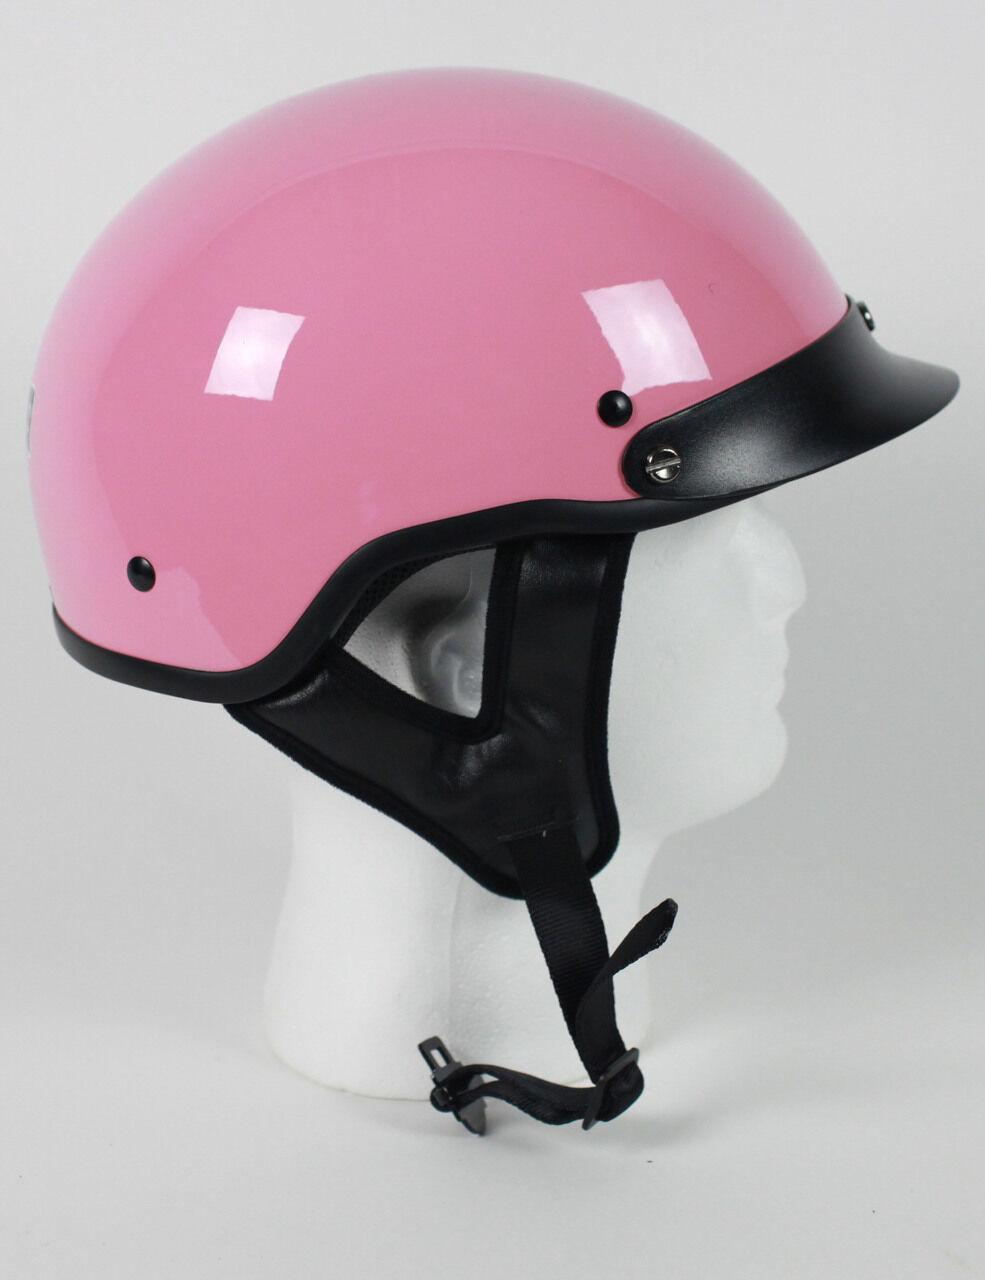 D.O.T PINK MOTORCYCLE HALF HELMET BEANIE HELMETS SHORTY LIGHTER NEW